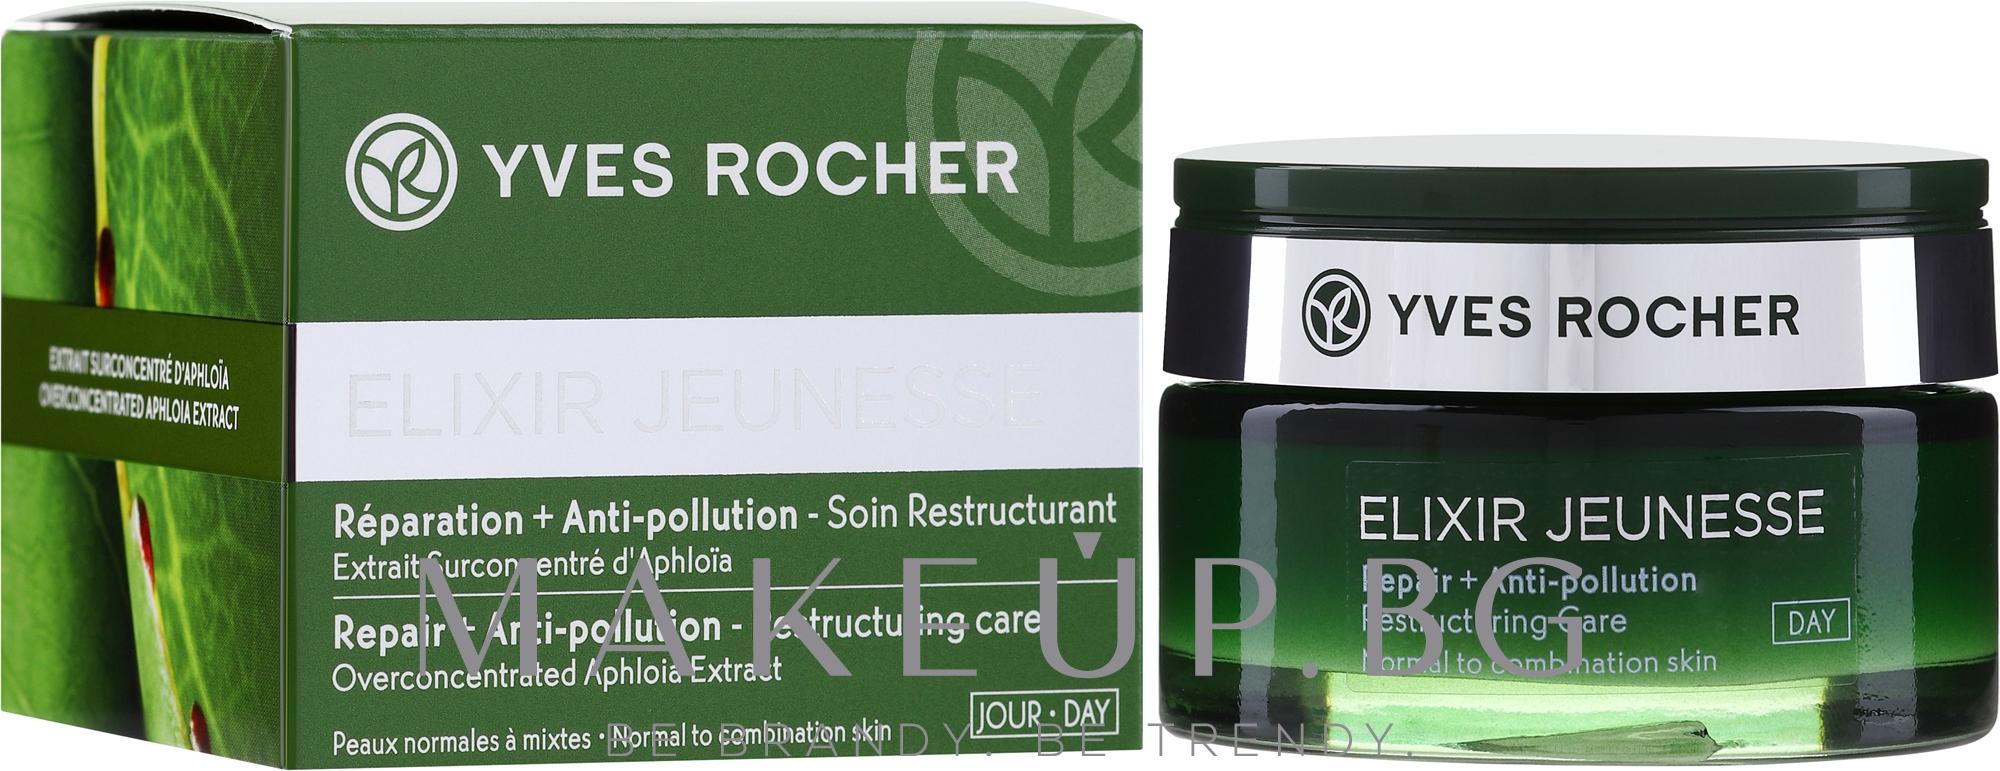 Дневен възстановяващ крем за лице - Yves Rocher Elixir Jeunesse Cream — снимка 50 ml